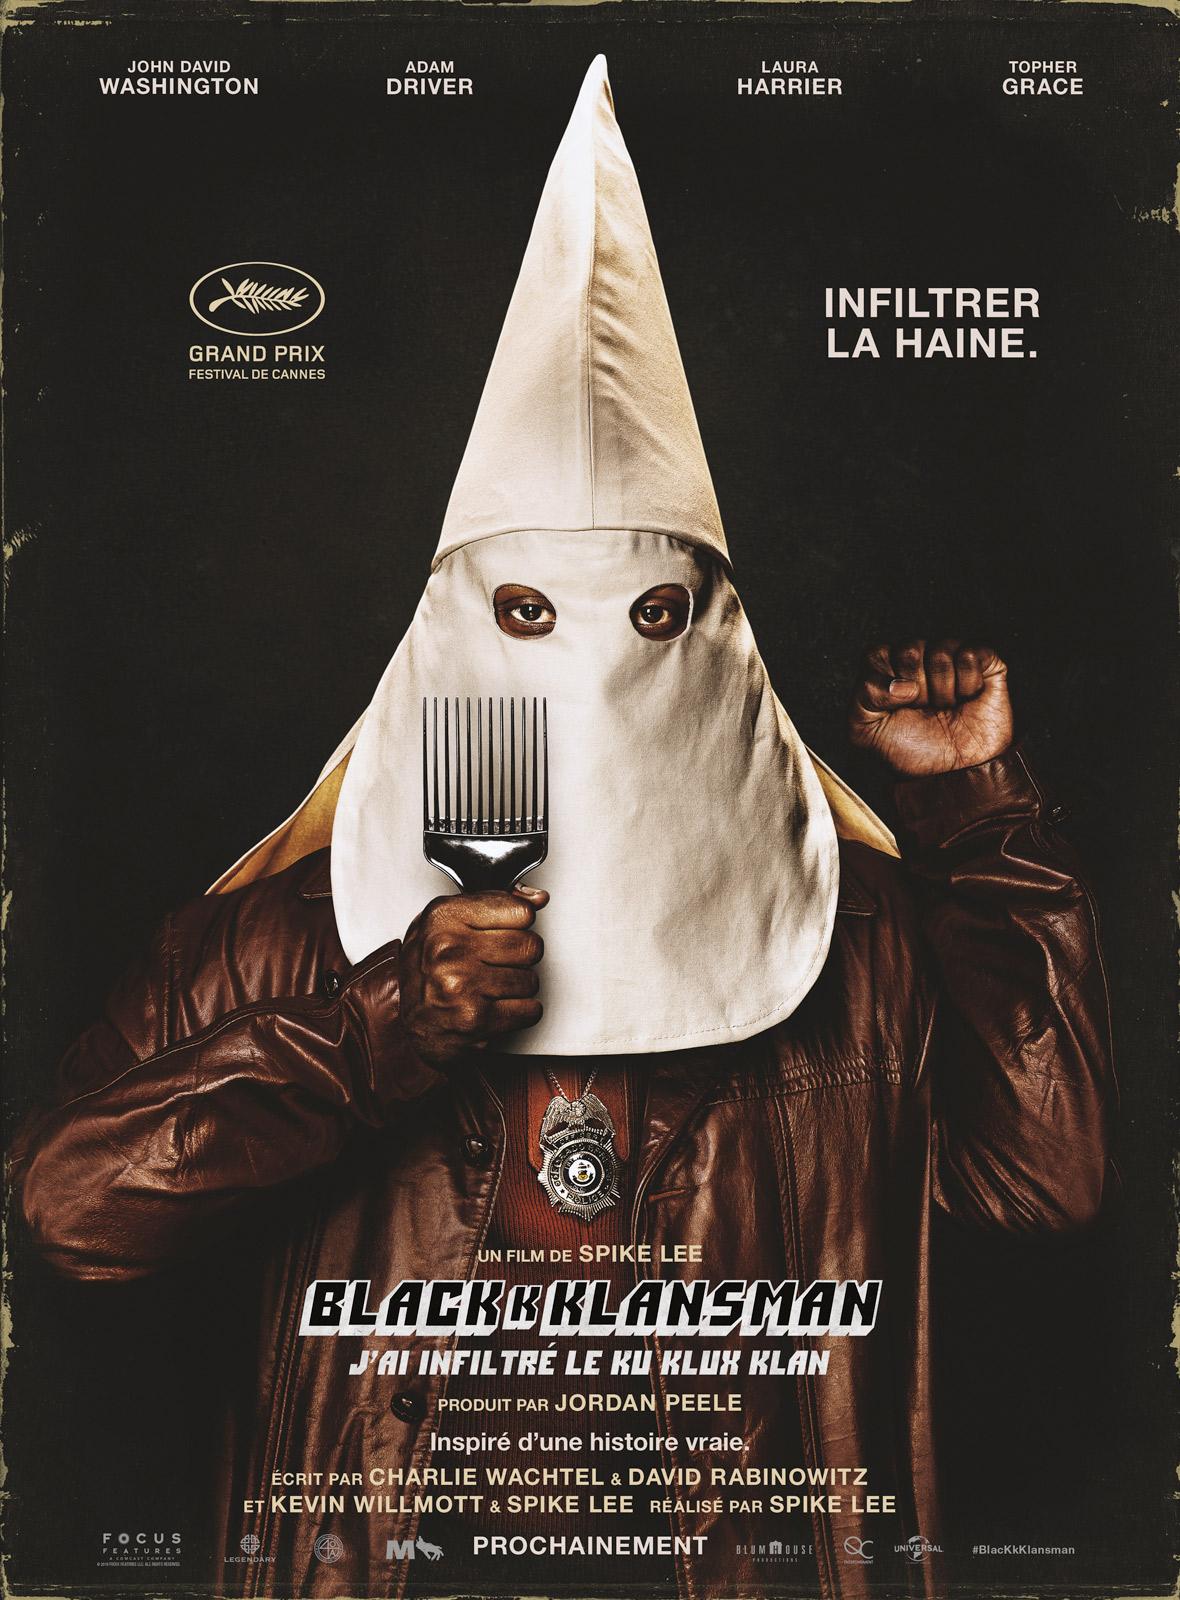 BLACKkKLANSMAN ; ku klux klan ; film ; histoire vraie ; infiltrer la haine ; spire les